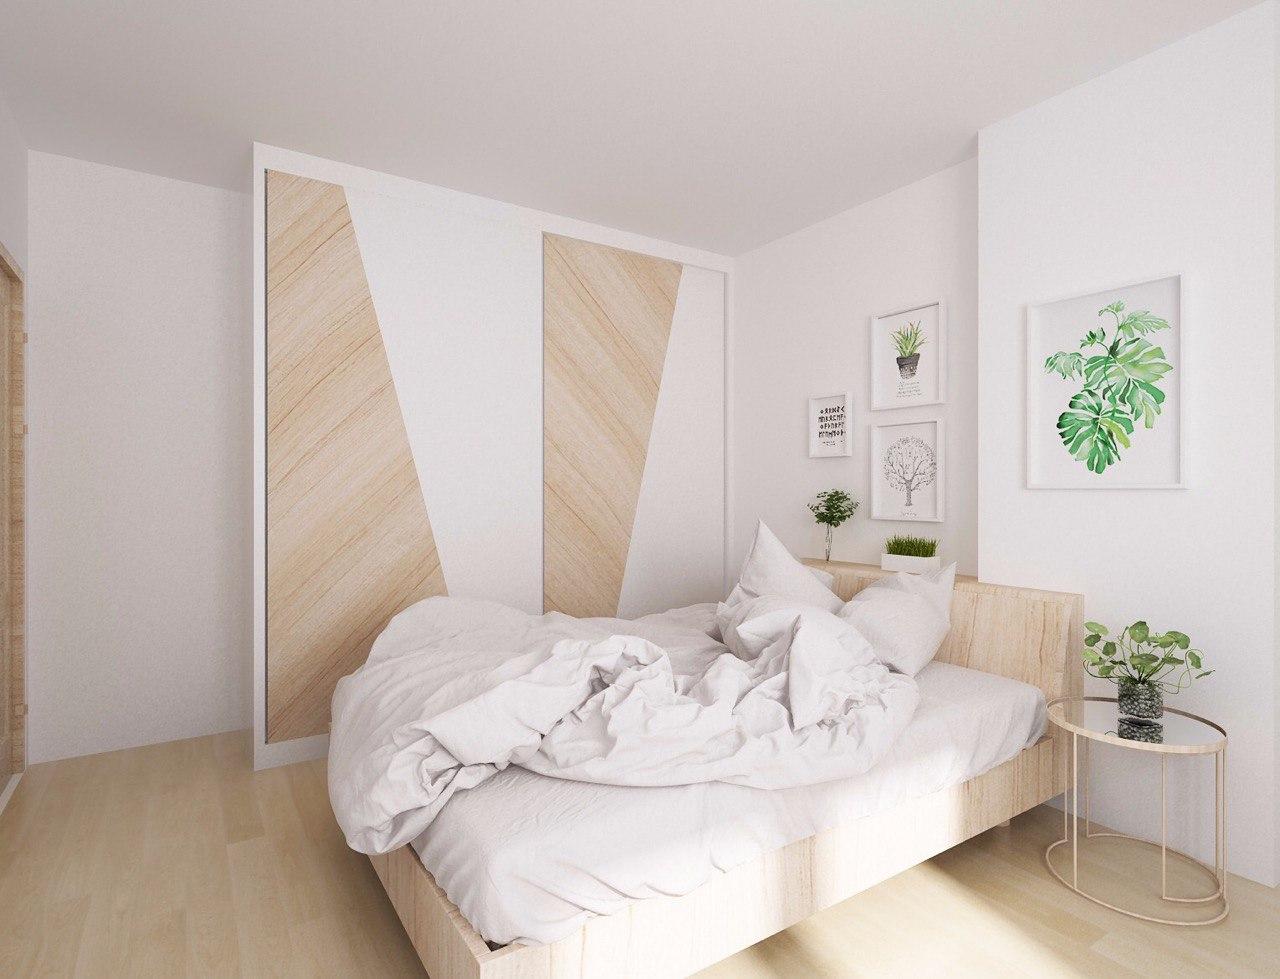 agcdesign hdb renovation singapore 4 room toa payoh master bedroom